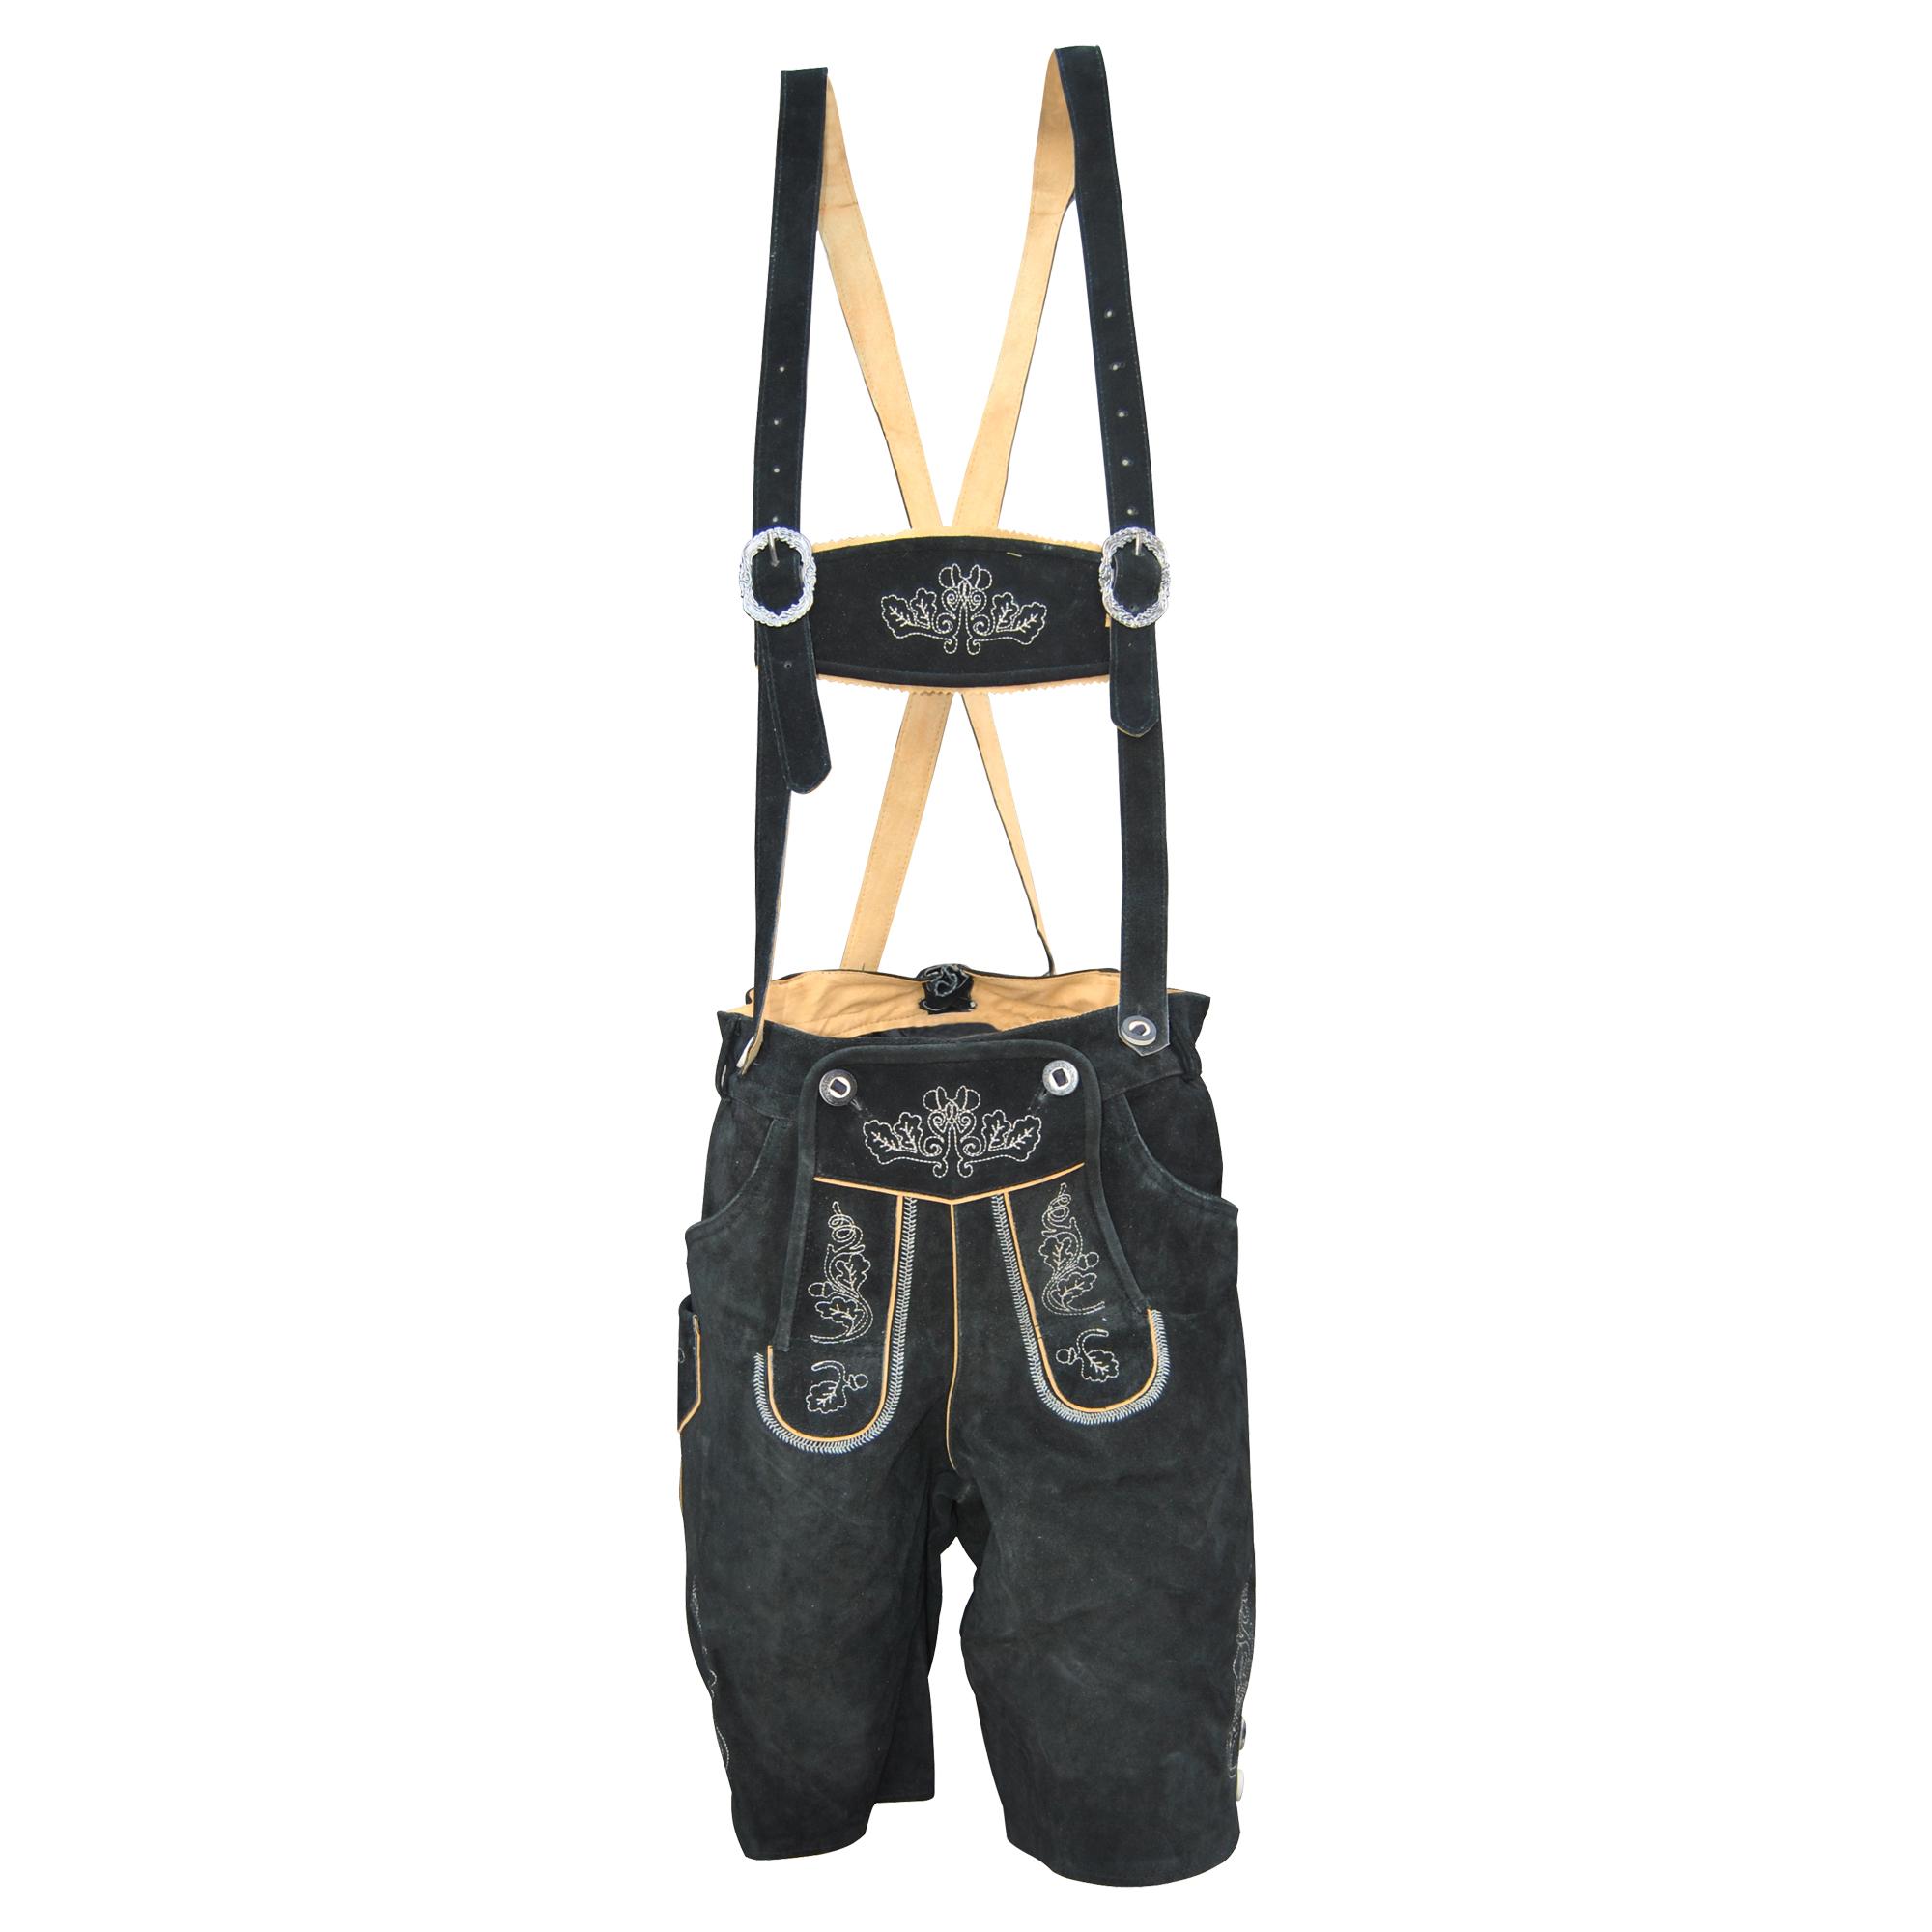 ec1bacb9a0 Traditional German Lederhosen Black - Lederhosen Wears